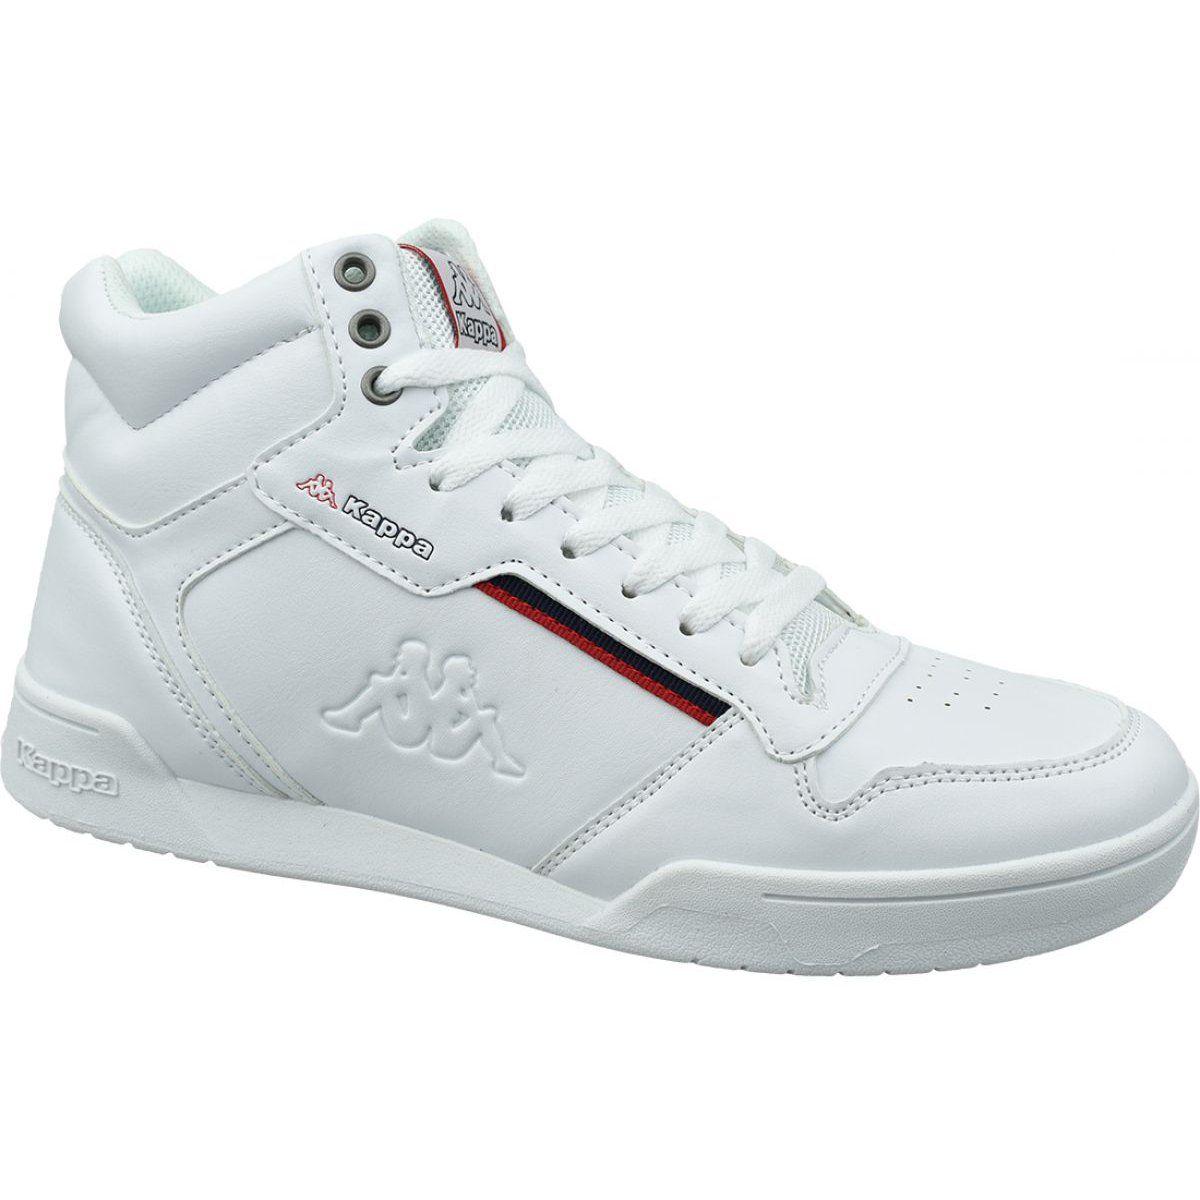 Buty Kappa Mangan M 242764 1020 Biale Shoes Shoes Mens Athletic Shoes